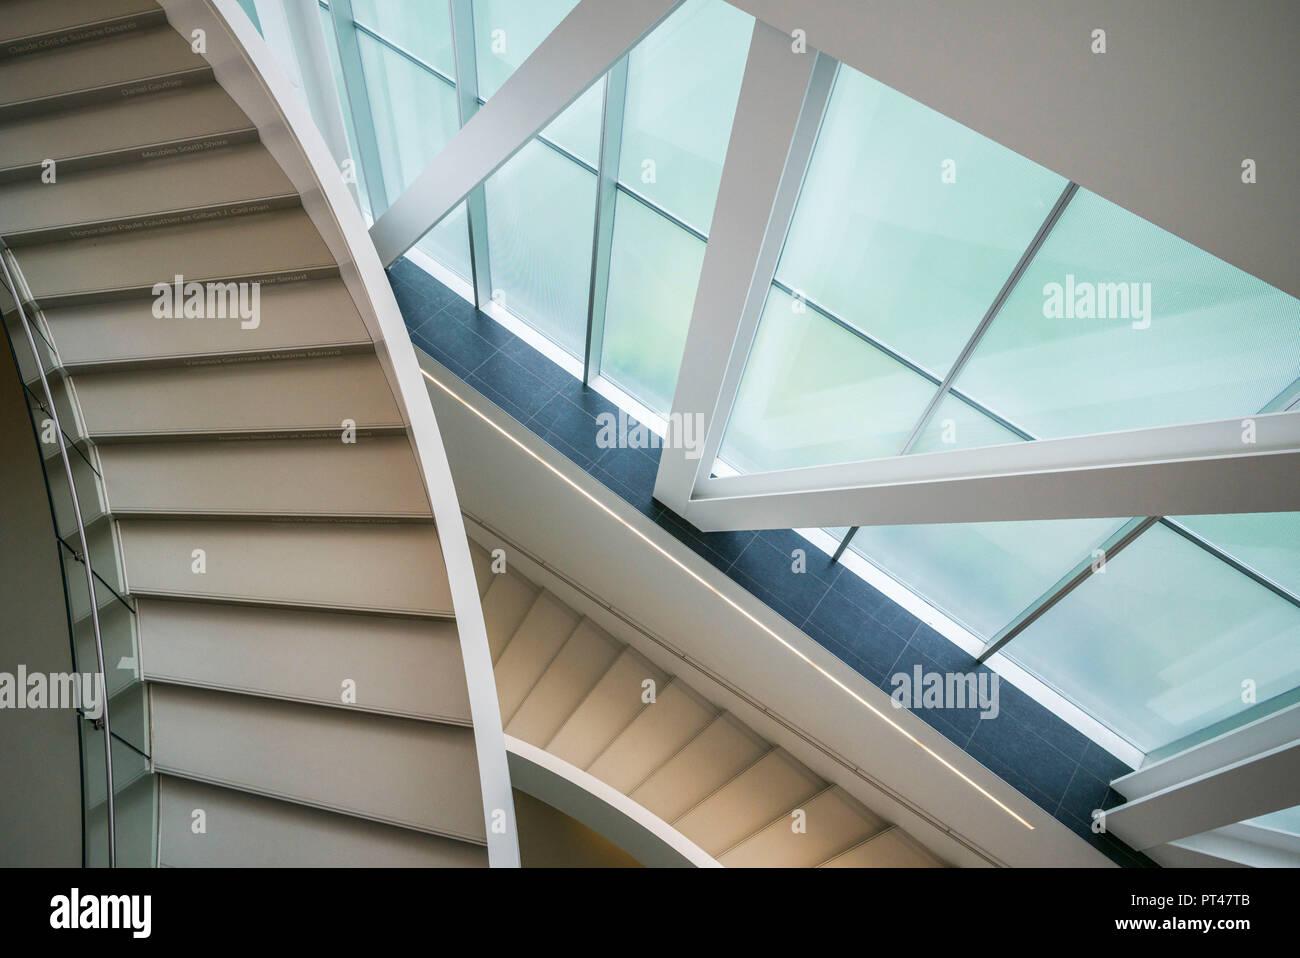 Canada, Quebec, Quebec City, Musee National des Beaux-Arts du Quebec, MNBAQ, pavillon Pierre-Lassonde, 2016, stairs Stock Photo